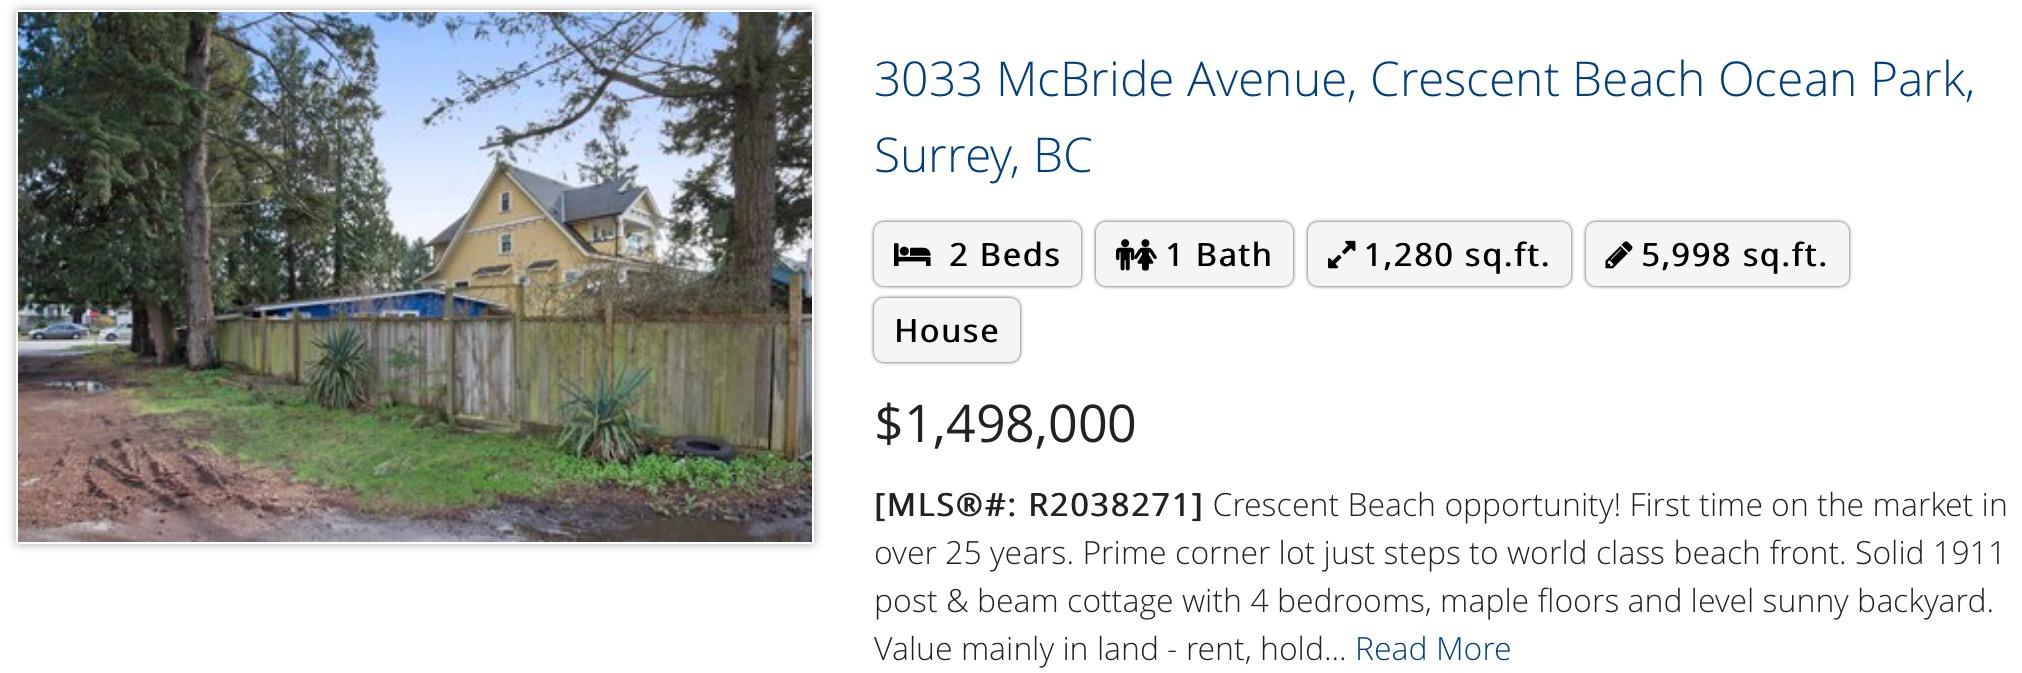 3033 McBride Avenue, Crescent Beach Ocean Park, Surrey, BC